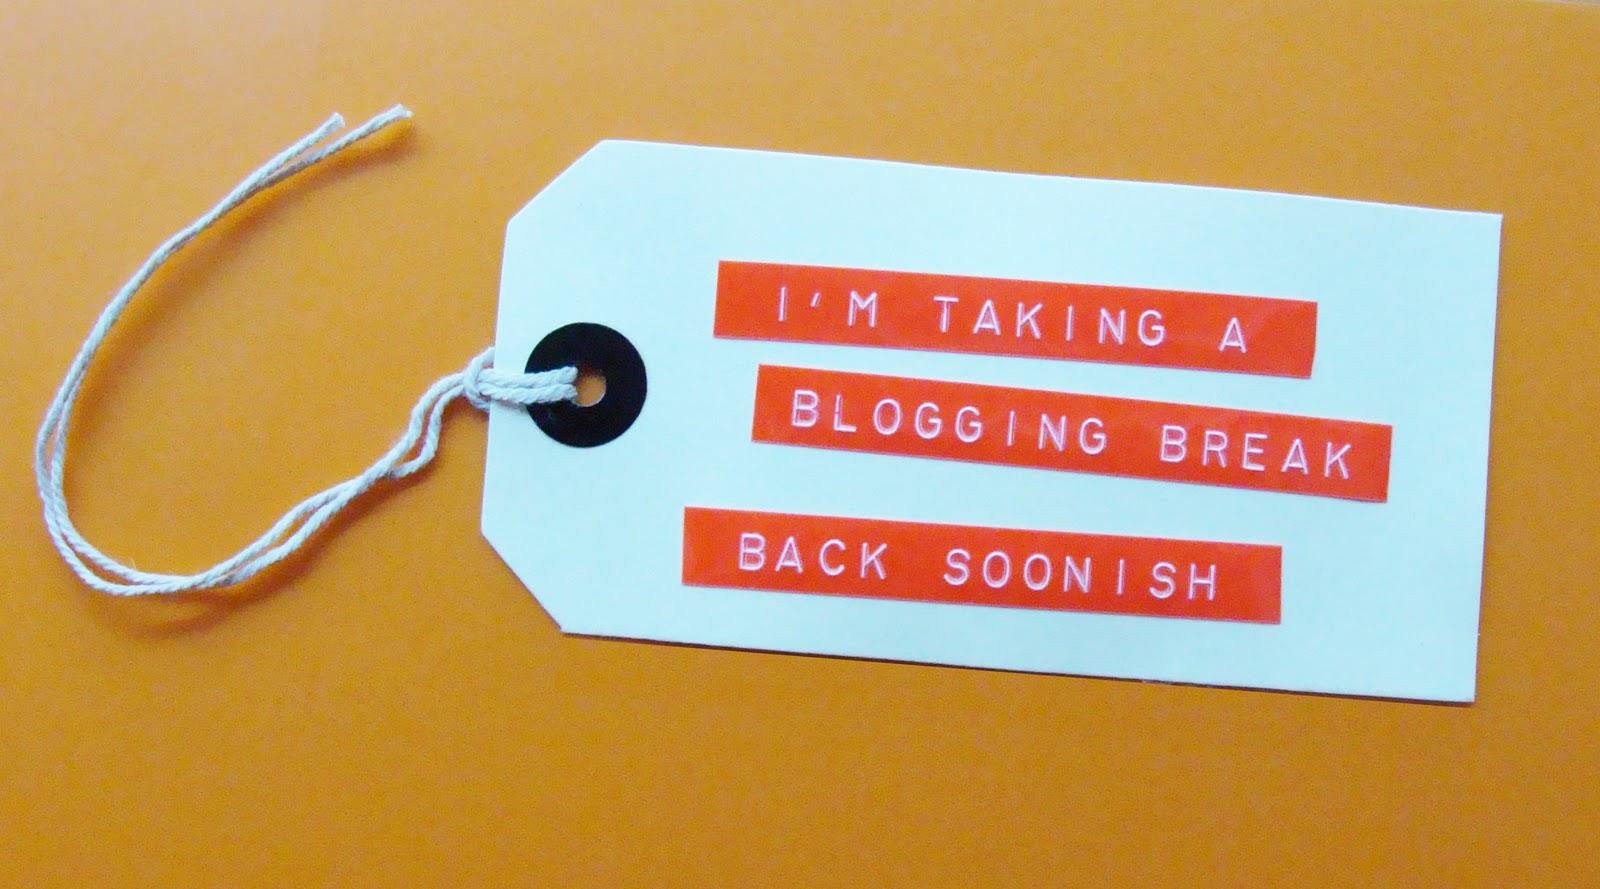 http://1.bp.blogspot.com/-BdizRhsr2aM/TfNo3wnslaI/AAAAAAAAAV4/qNIi2_XoXqg/s1600/BloggingBreak.jpg